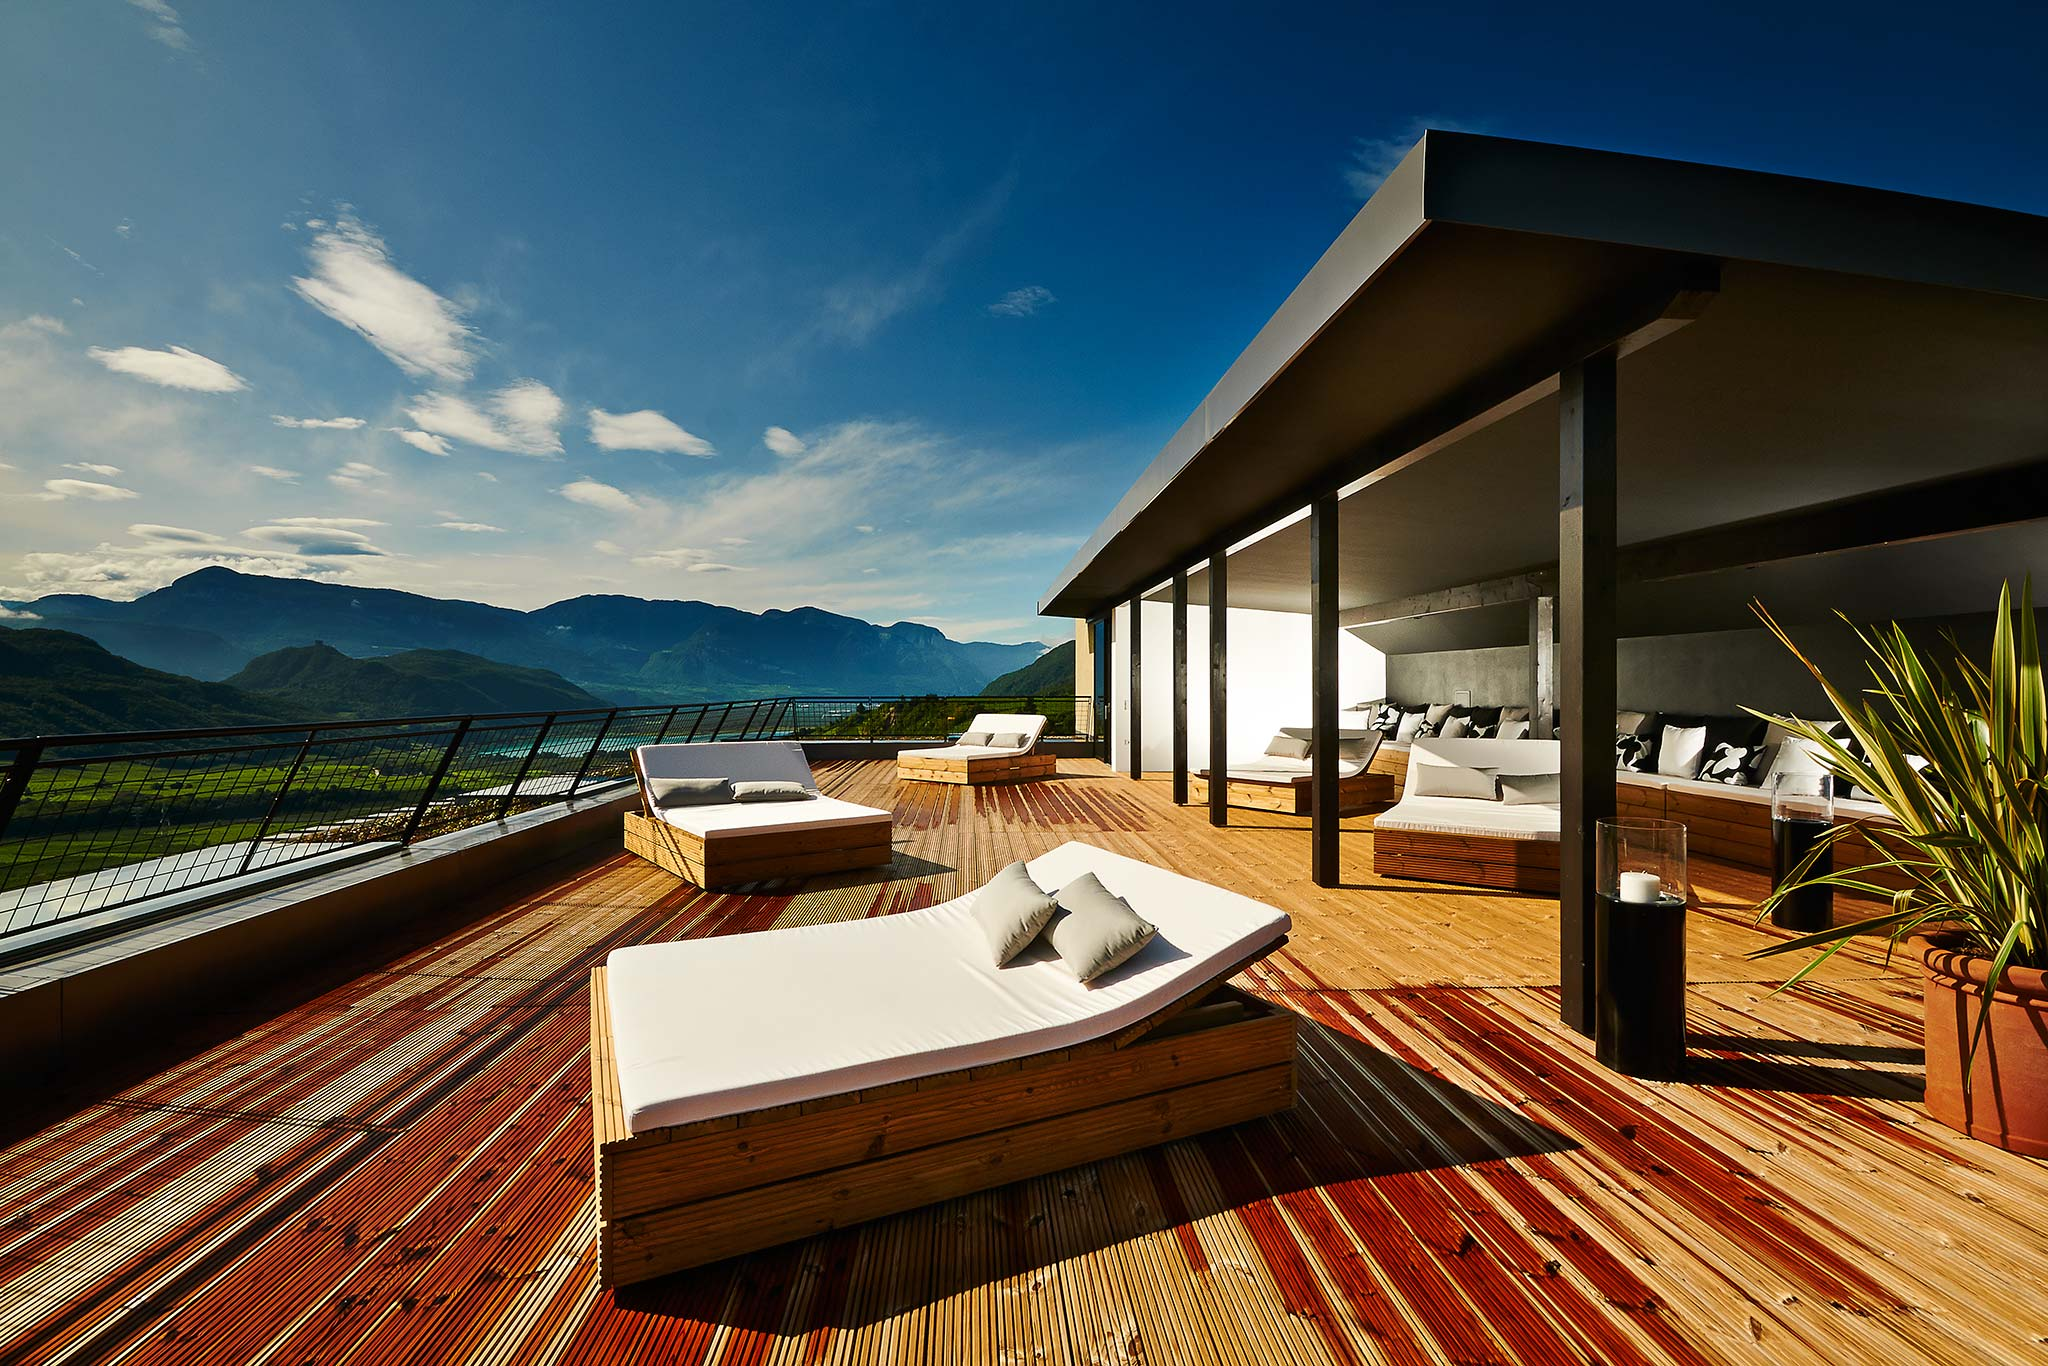 Gewinnspiel vinum hotels s dtirol ankommen genie en for Designhotel gius la residenza